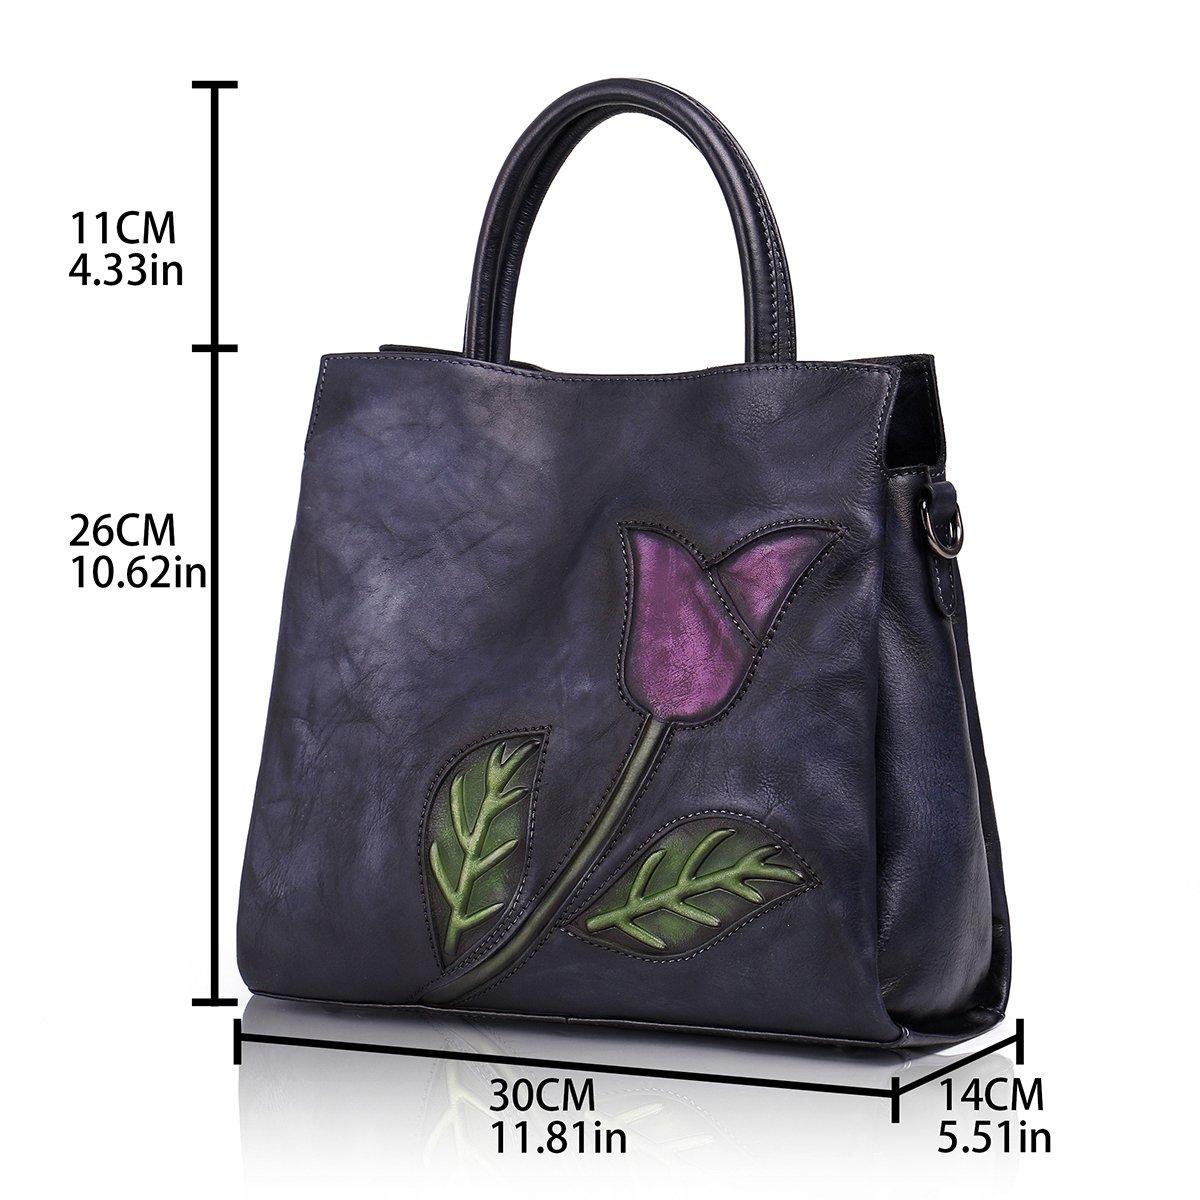 Aphison Designer Soft Leather Totes Handbags for Women, Ladies Satchels Shoulder Bags (BLACK) by APHISON (Image #5)